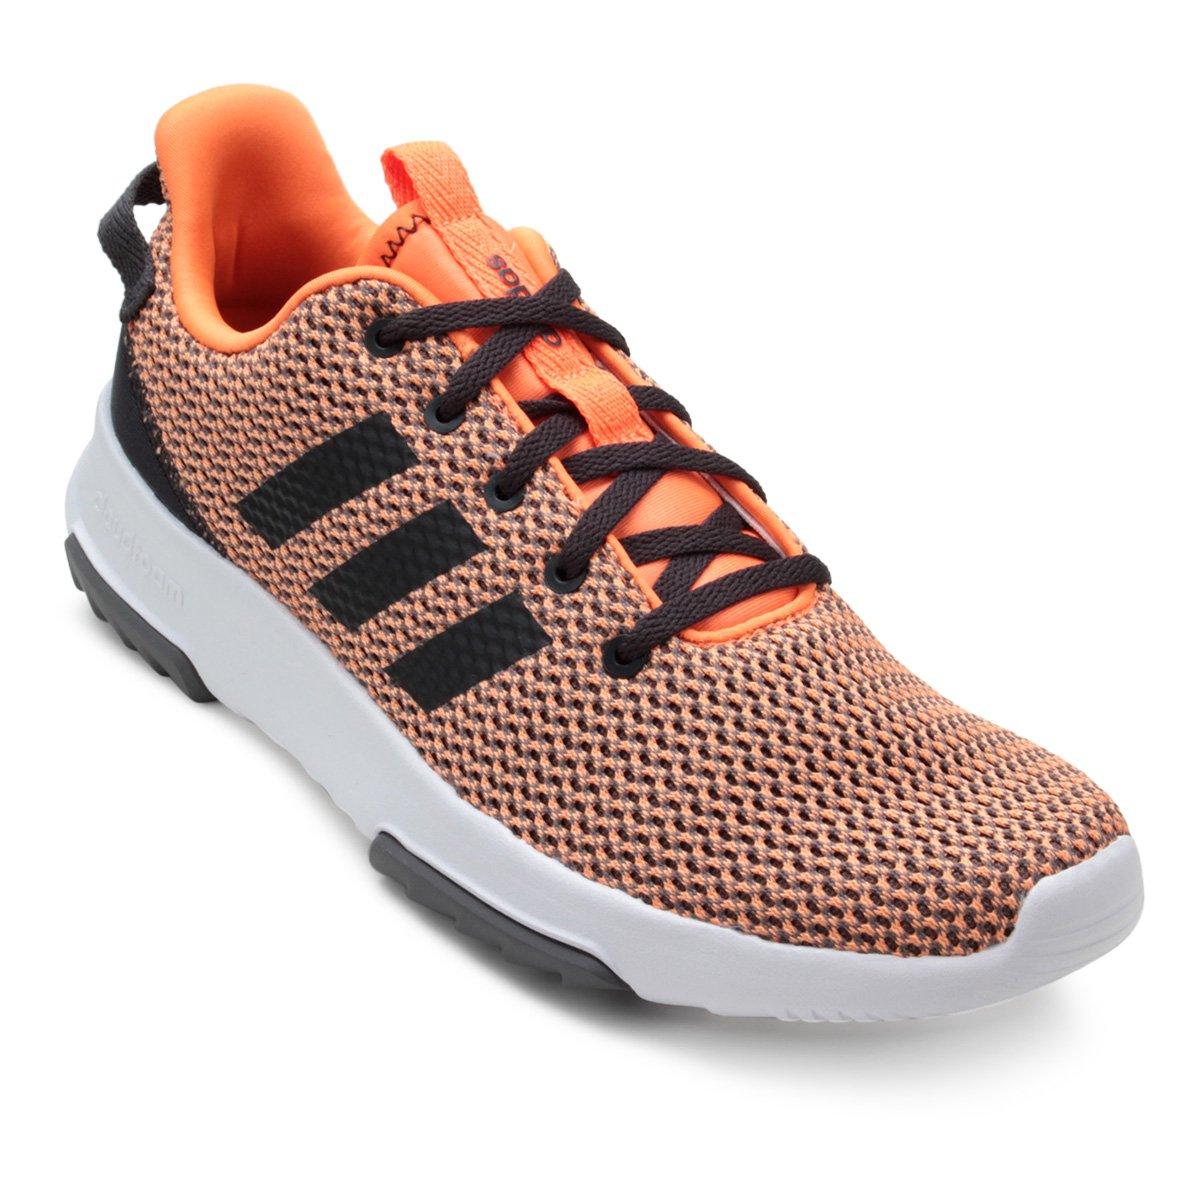 301bbe7125 Tênis Adidas Cf Racer Tr Masculino - Laranja - Compre Agora